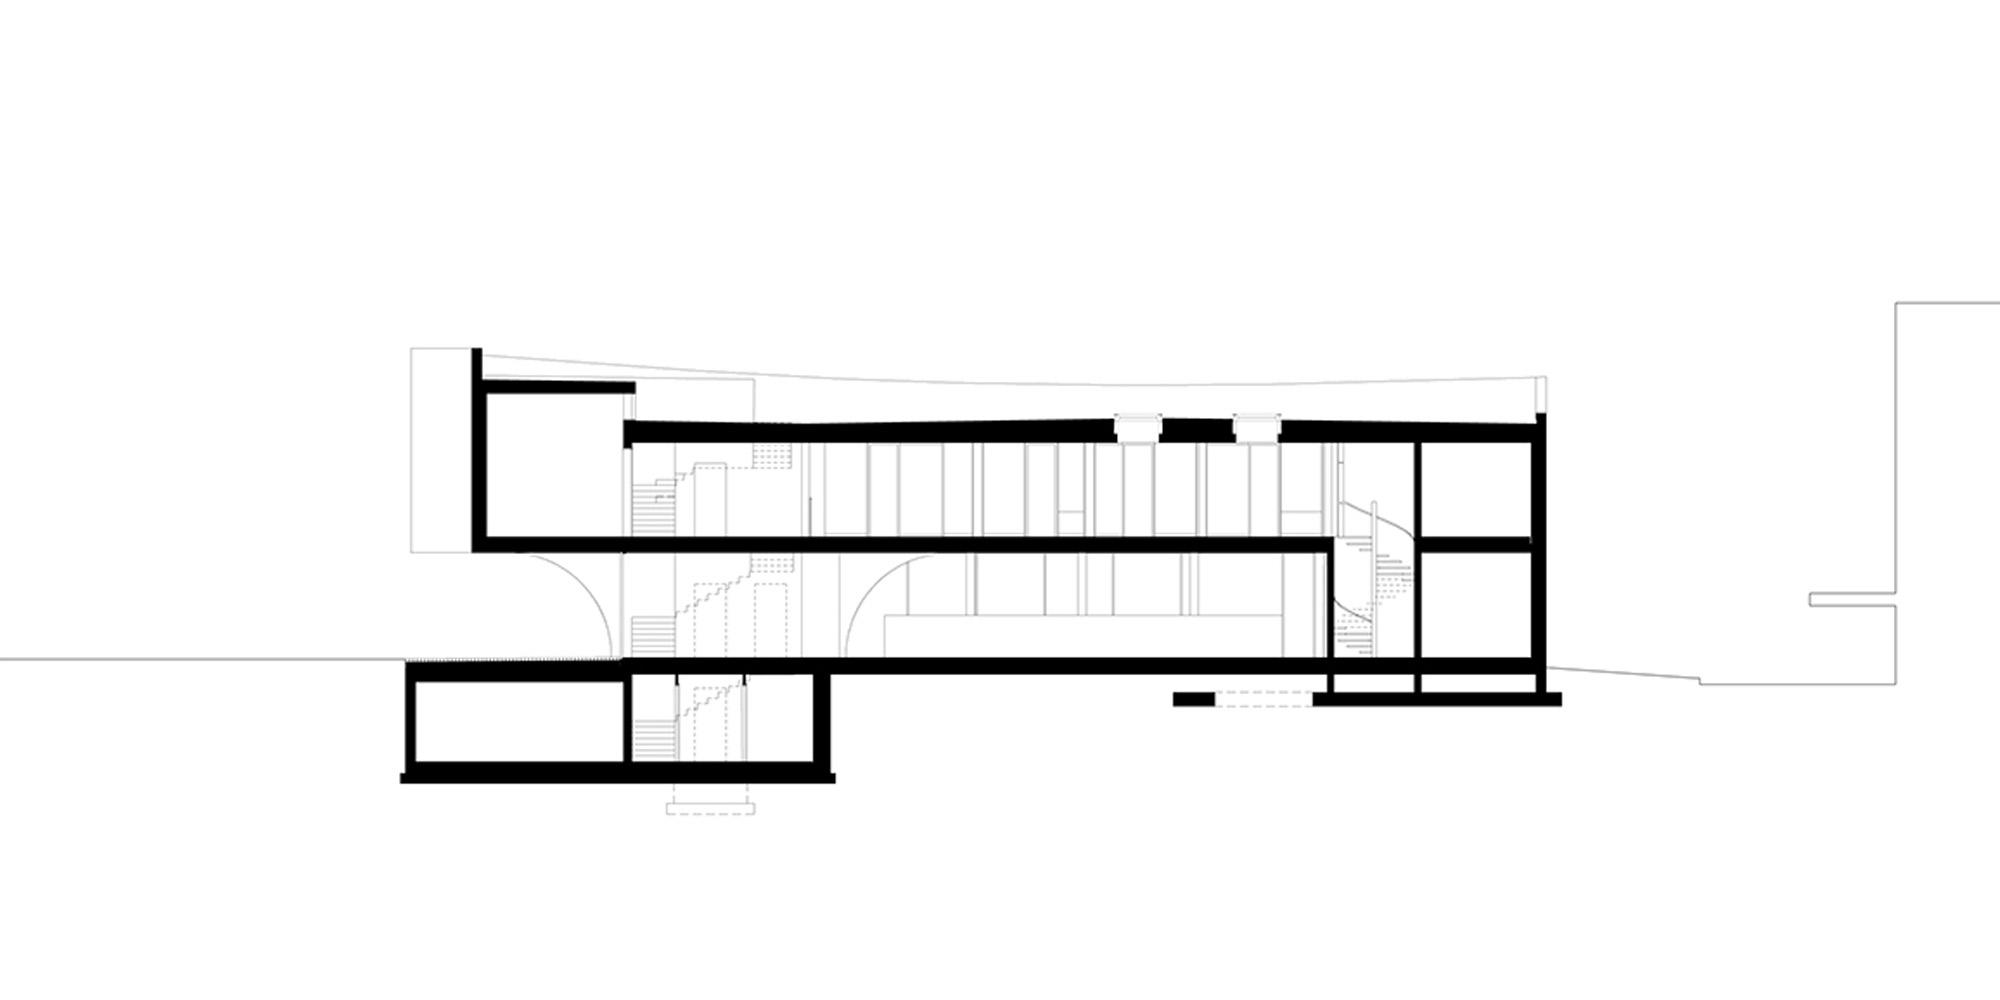 Sezione longitudinale © MoDus Architects